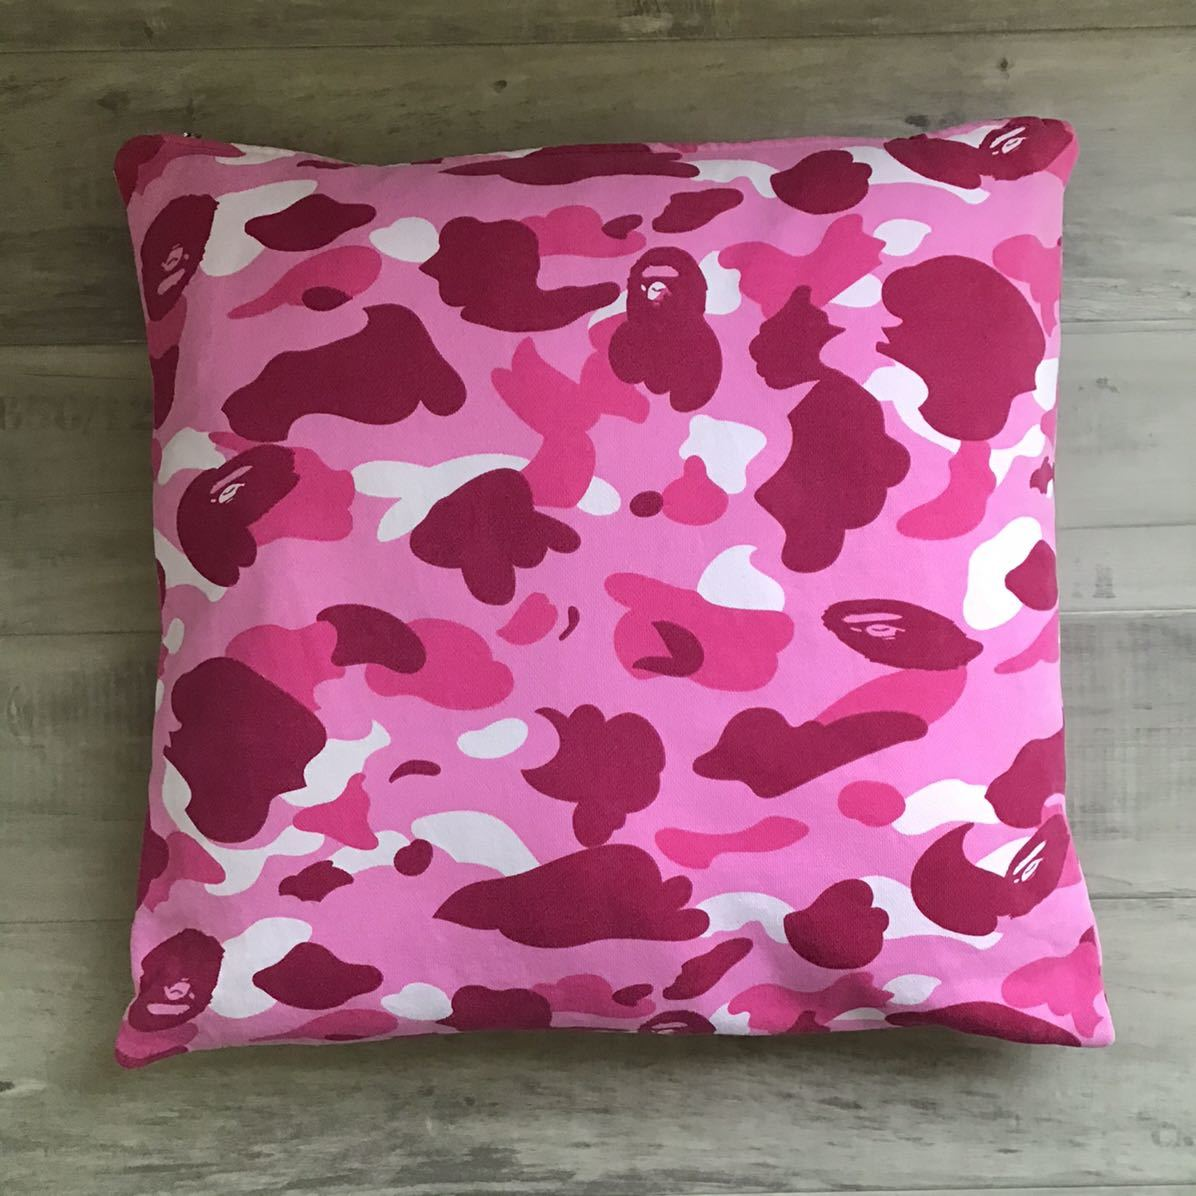 pink camo クッション a bathing ape BAPE cushion エイプ ベイプ アベイシングエイプ ピンクカモ 迷彩 nigo vintage